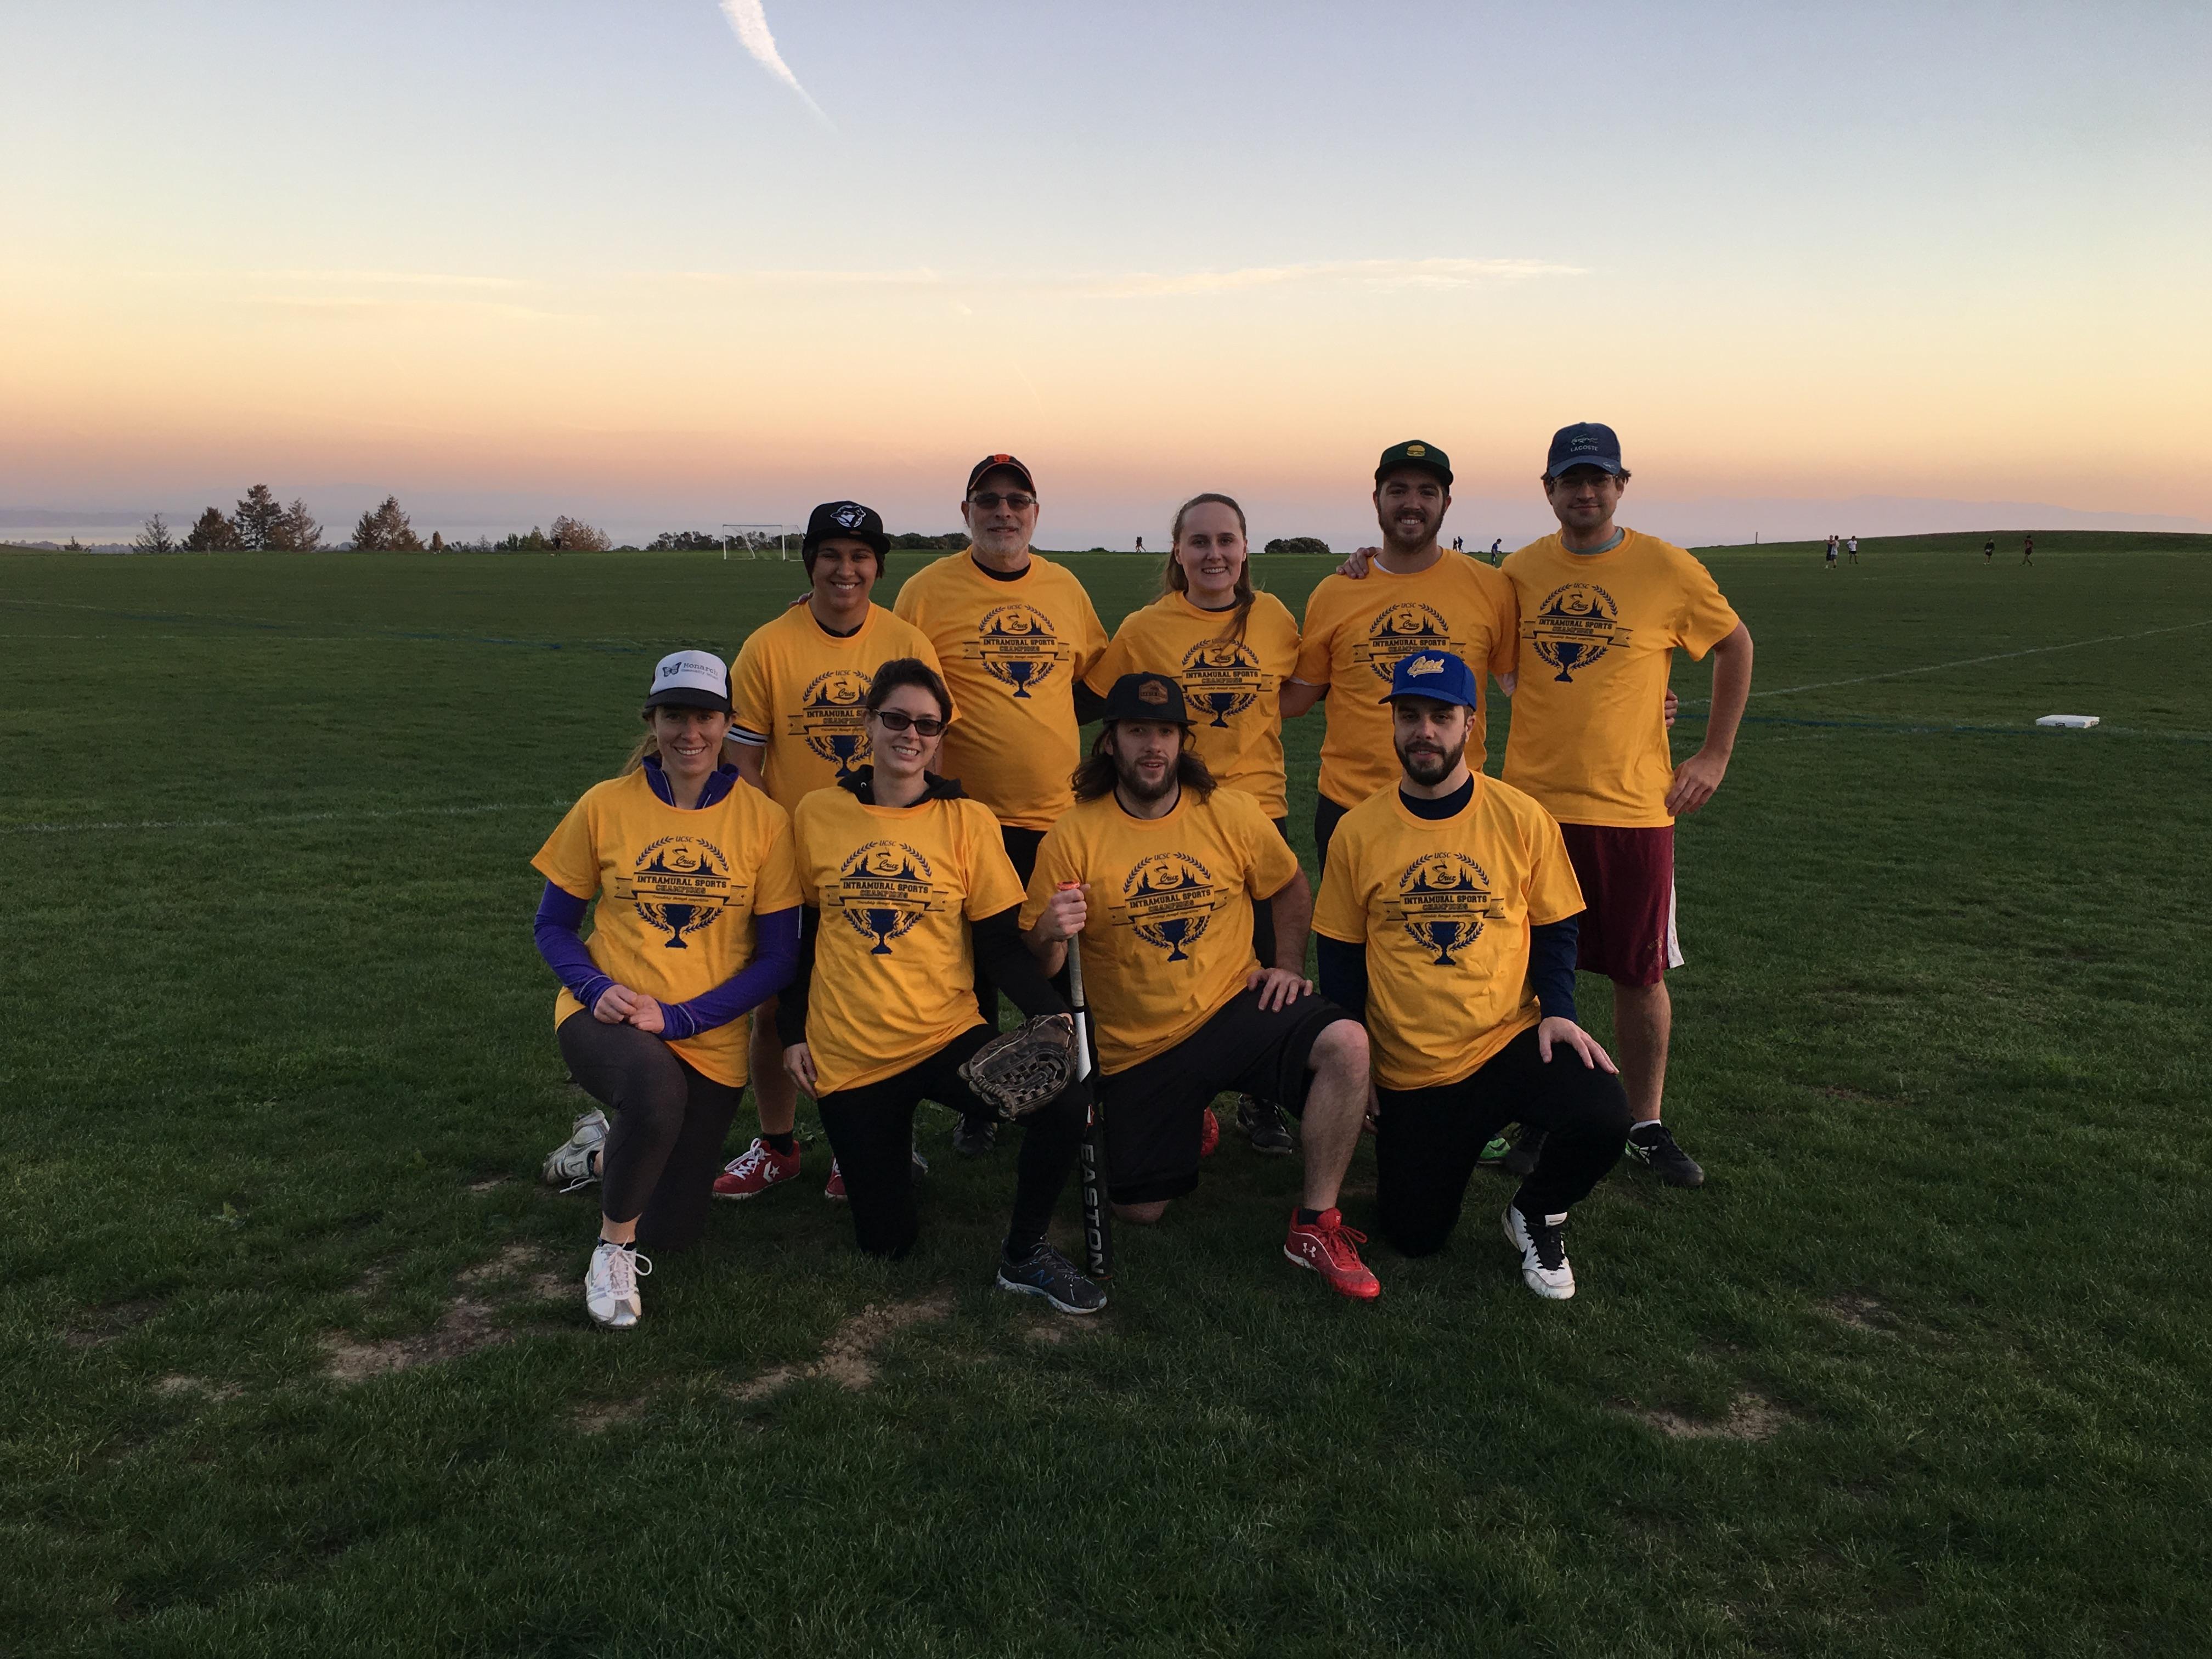 Fall 2016 Coed Softball Team